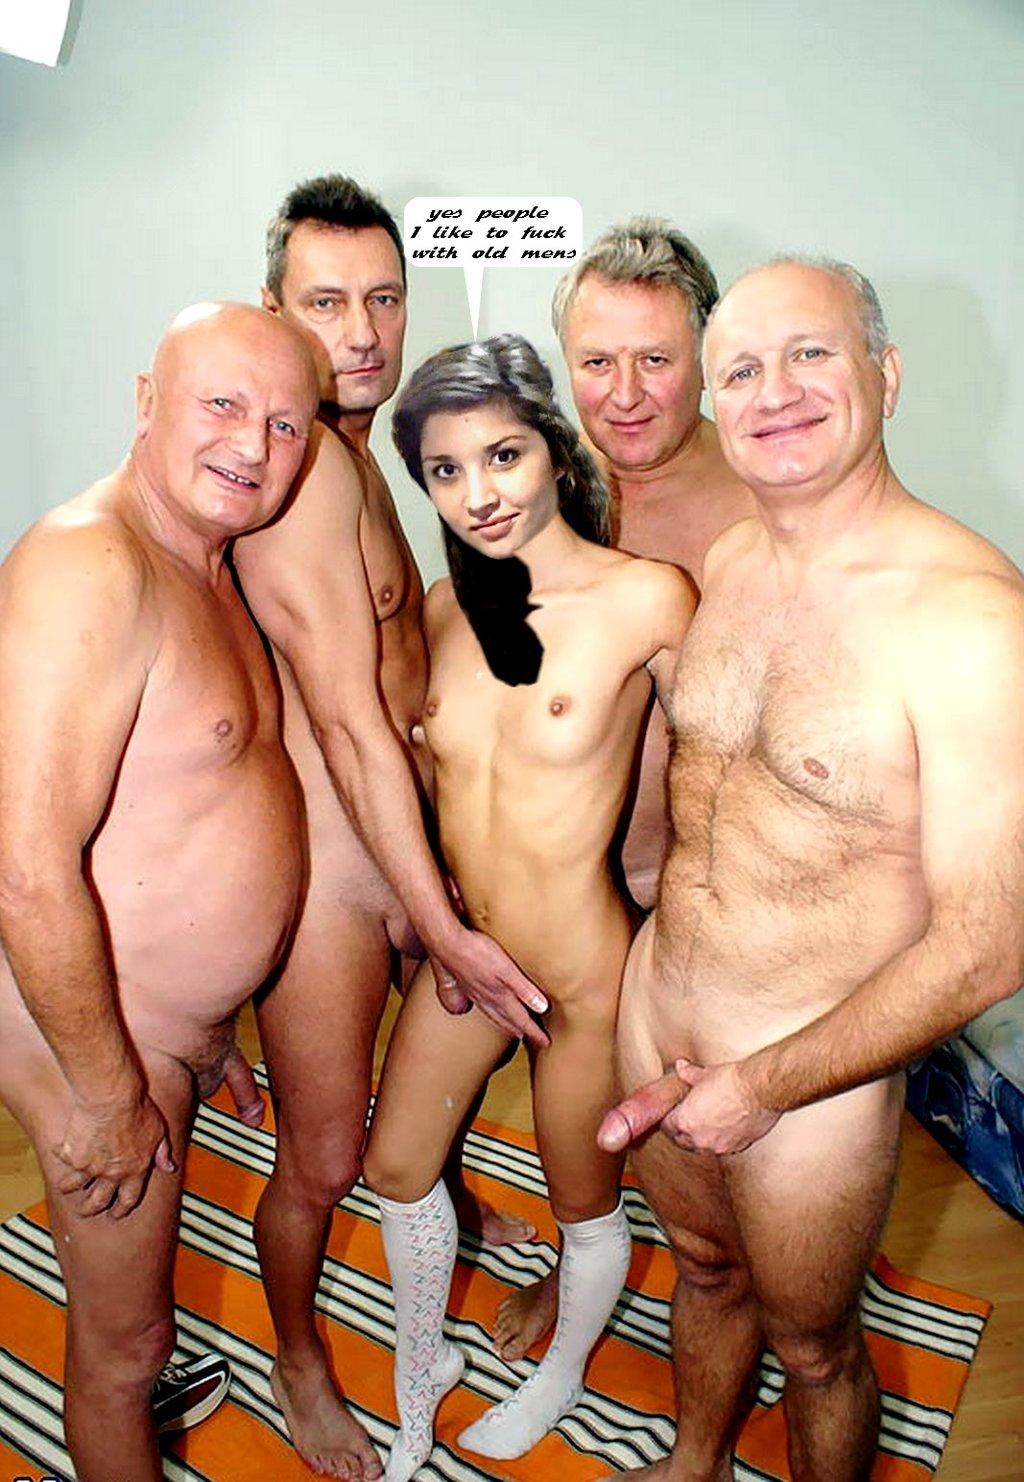 staroe-nemetskoe-porno-intsest